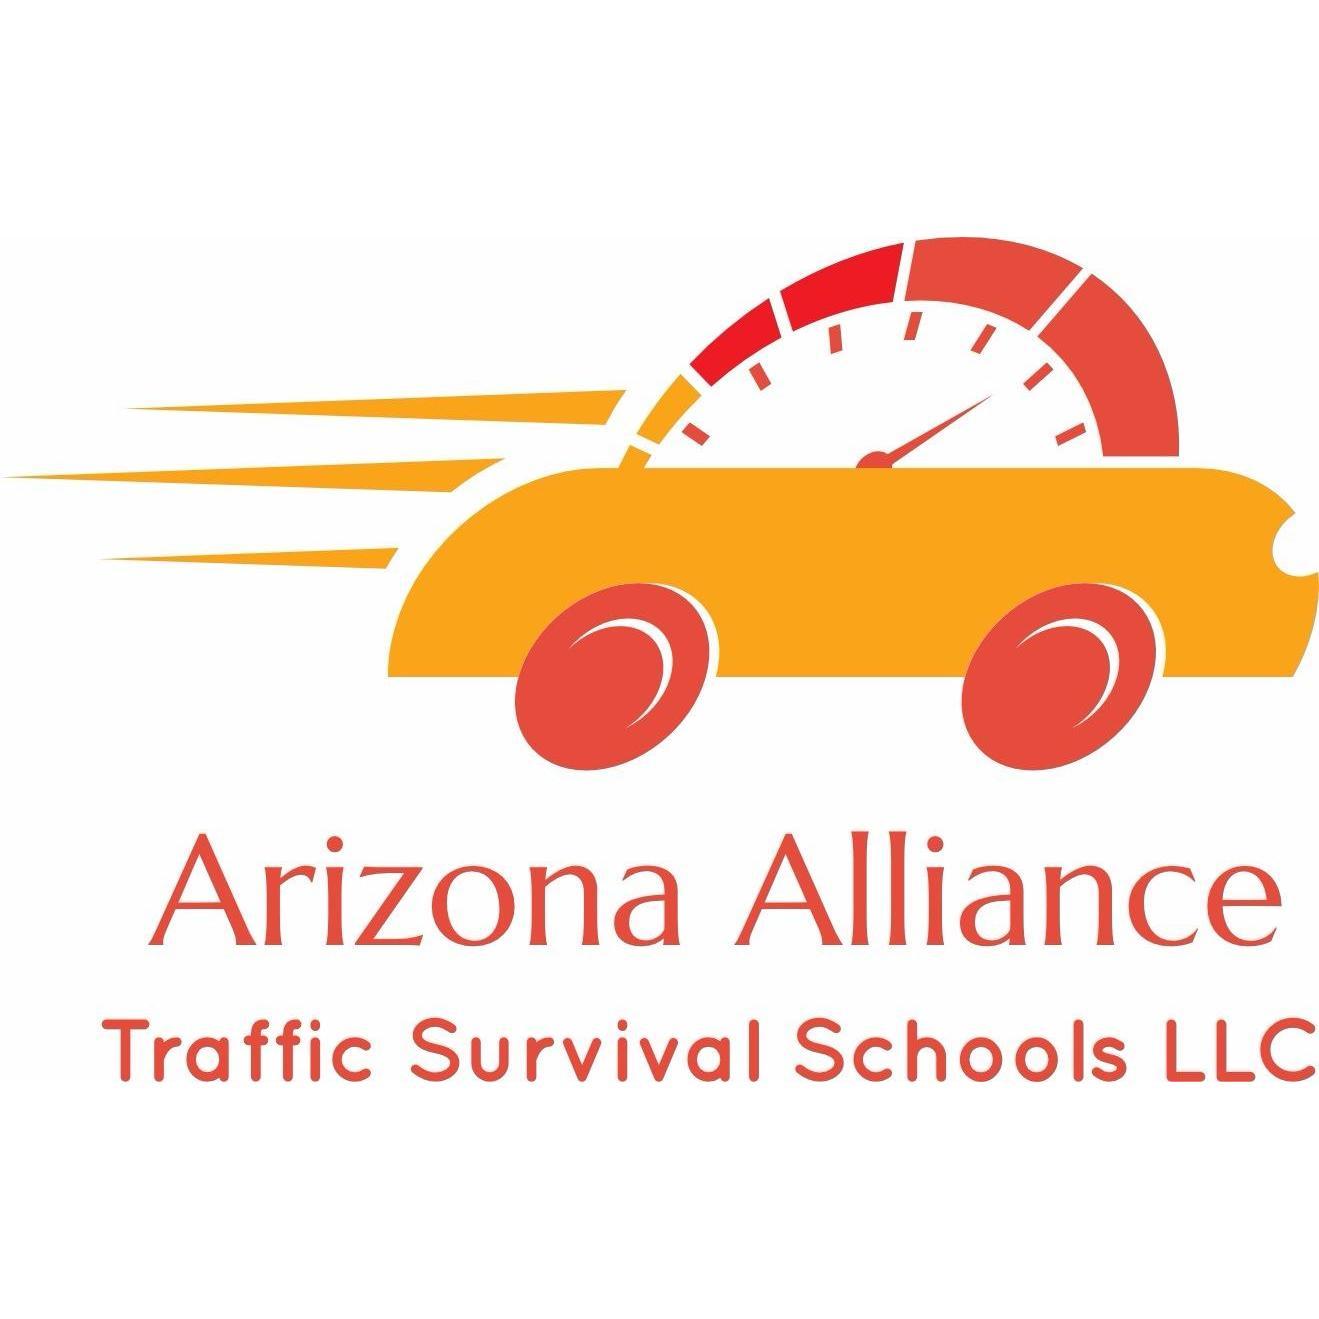 Arizona Alliance Traffic Survival School